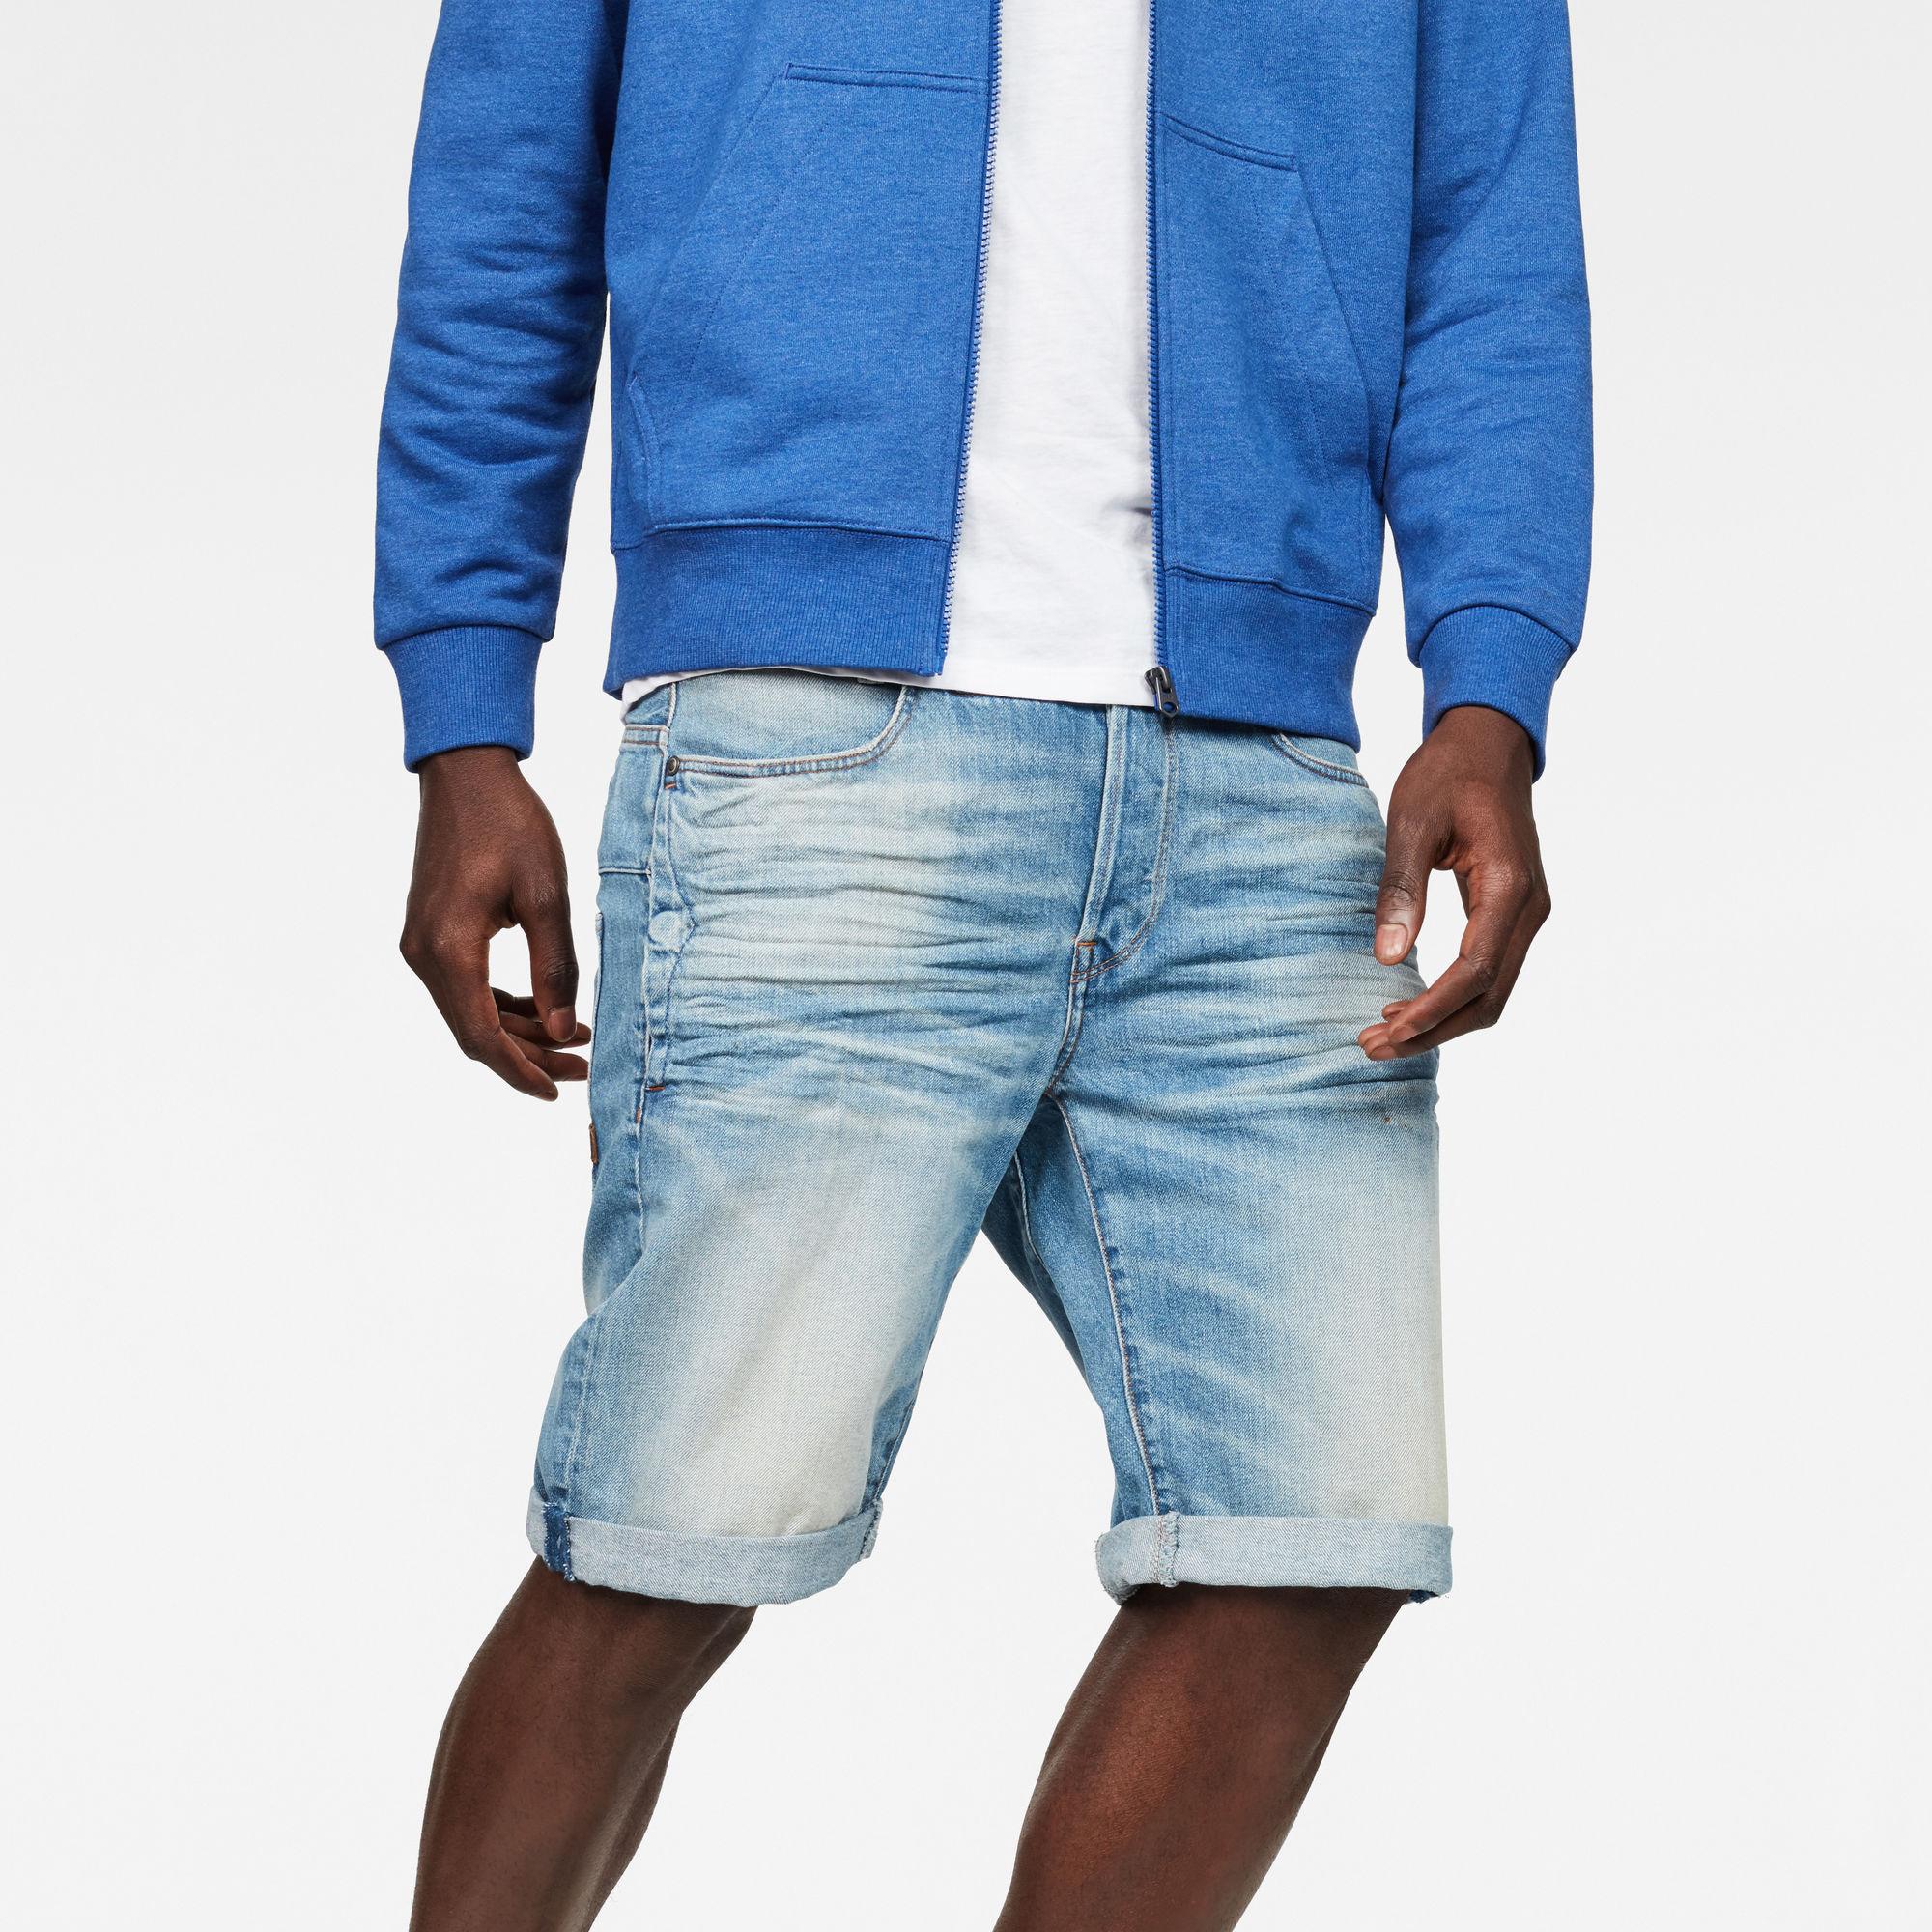 D-Staq 3D 1 2-Length Shorts